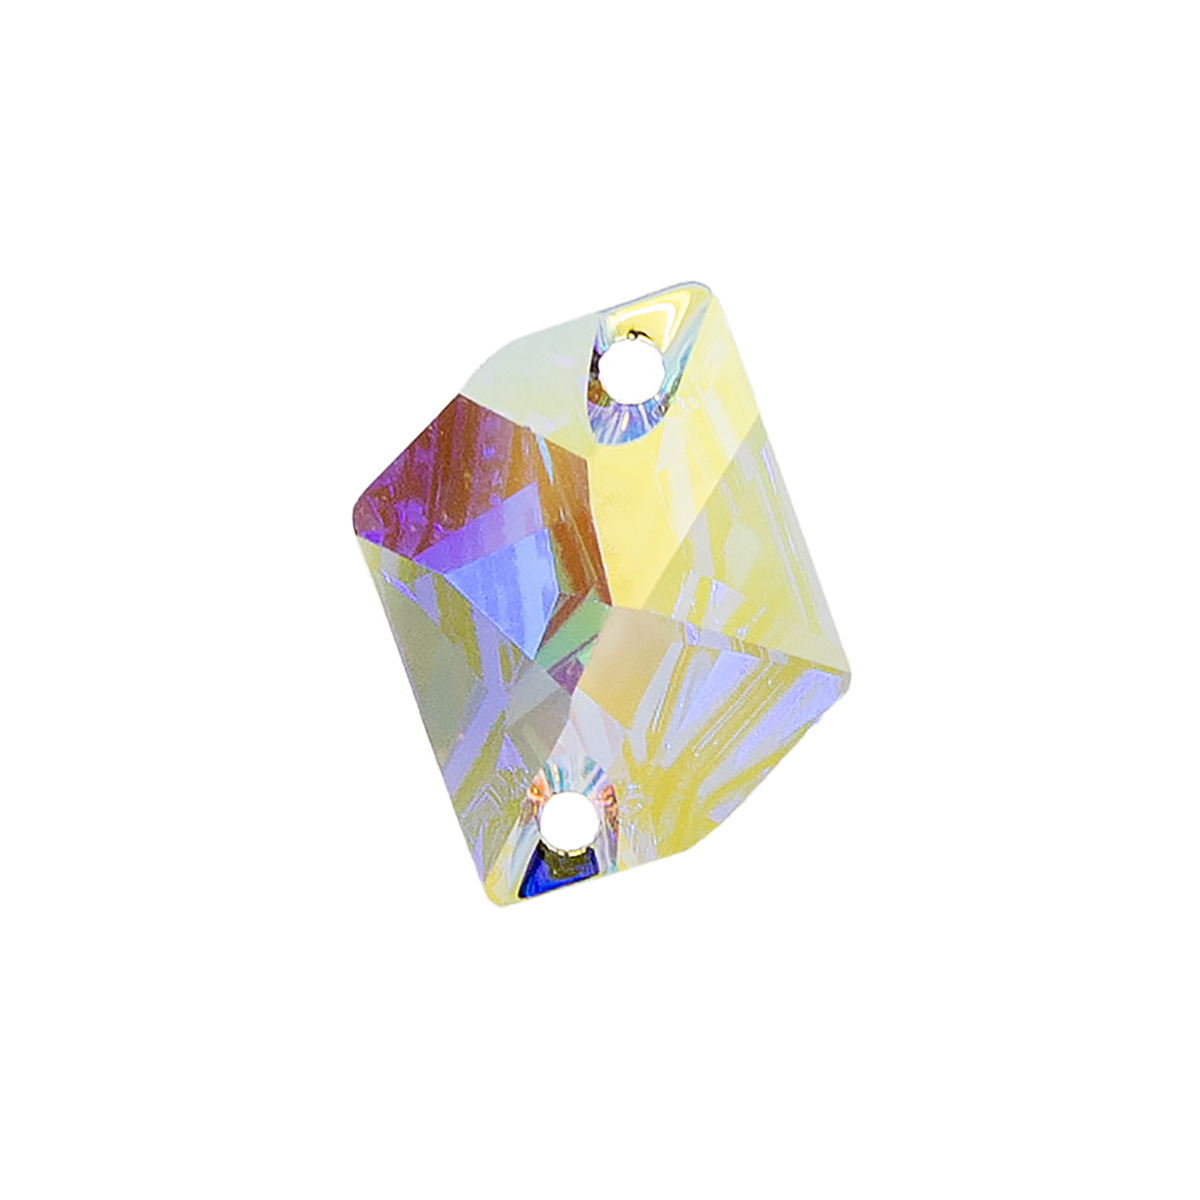 Нашивные кристаллы(камень) 3265/E 20.0*16.0мм кристалл с эфф. 1шт. Swarovski